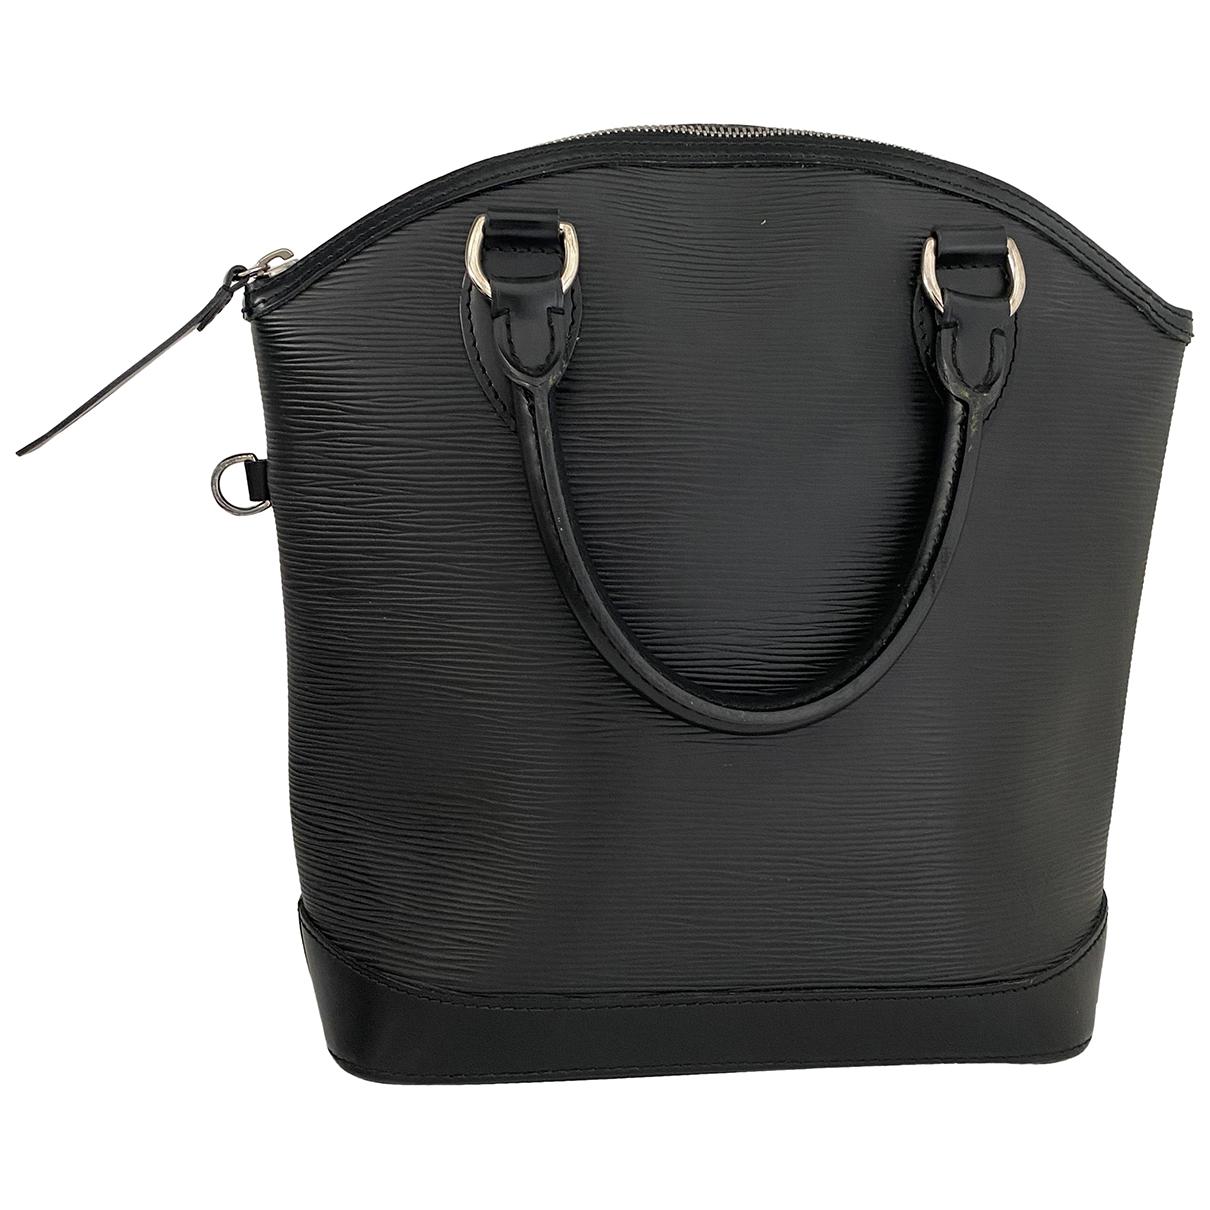 Louis Vuitton Lockit Vertical Black Leather handbag for Women N